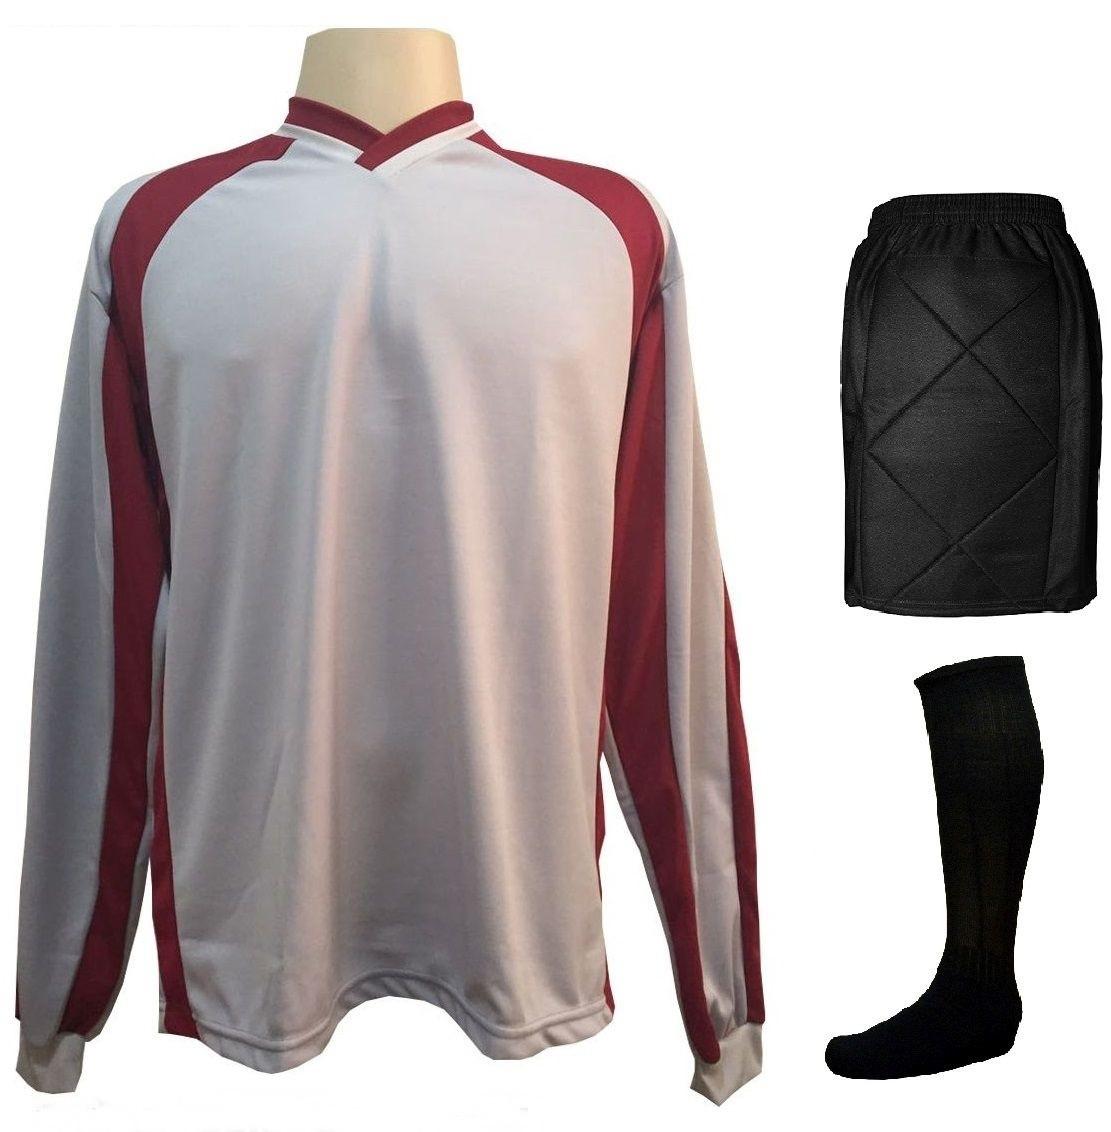 Fardamento Completo modelo Bélgica 20+2 (20 camisas Royal/Branco + 20 calções modelo Copa Royal/Branco + 20 pares de meiões Royal + 2 conjuntos de goleiro) + Brindes